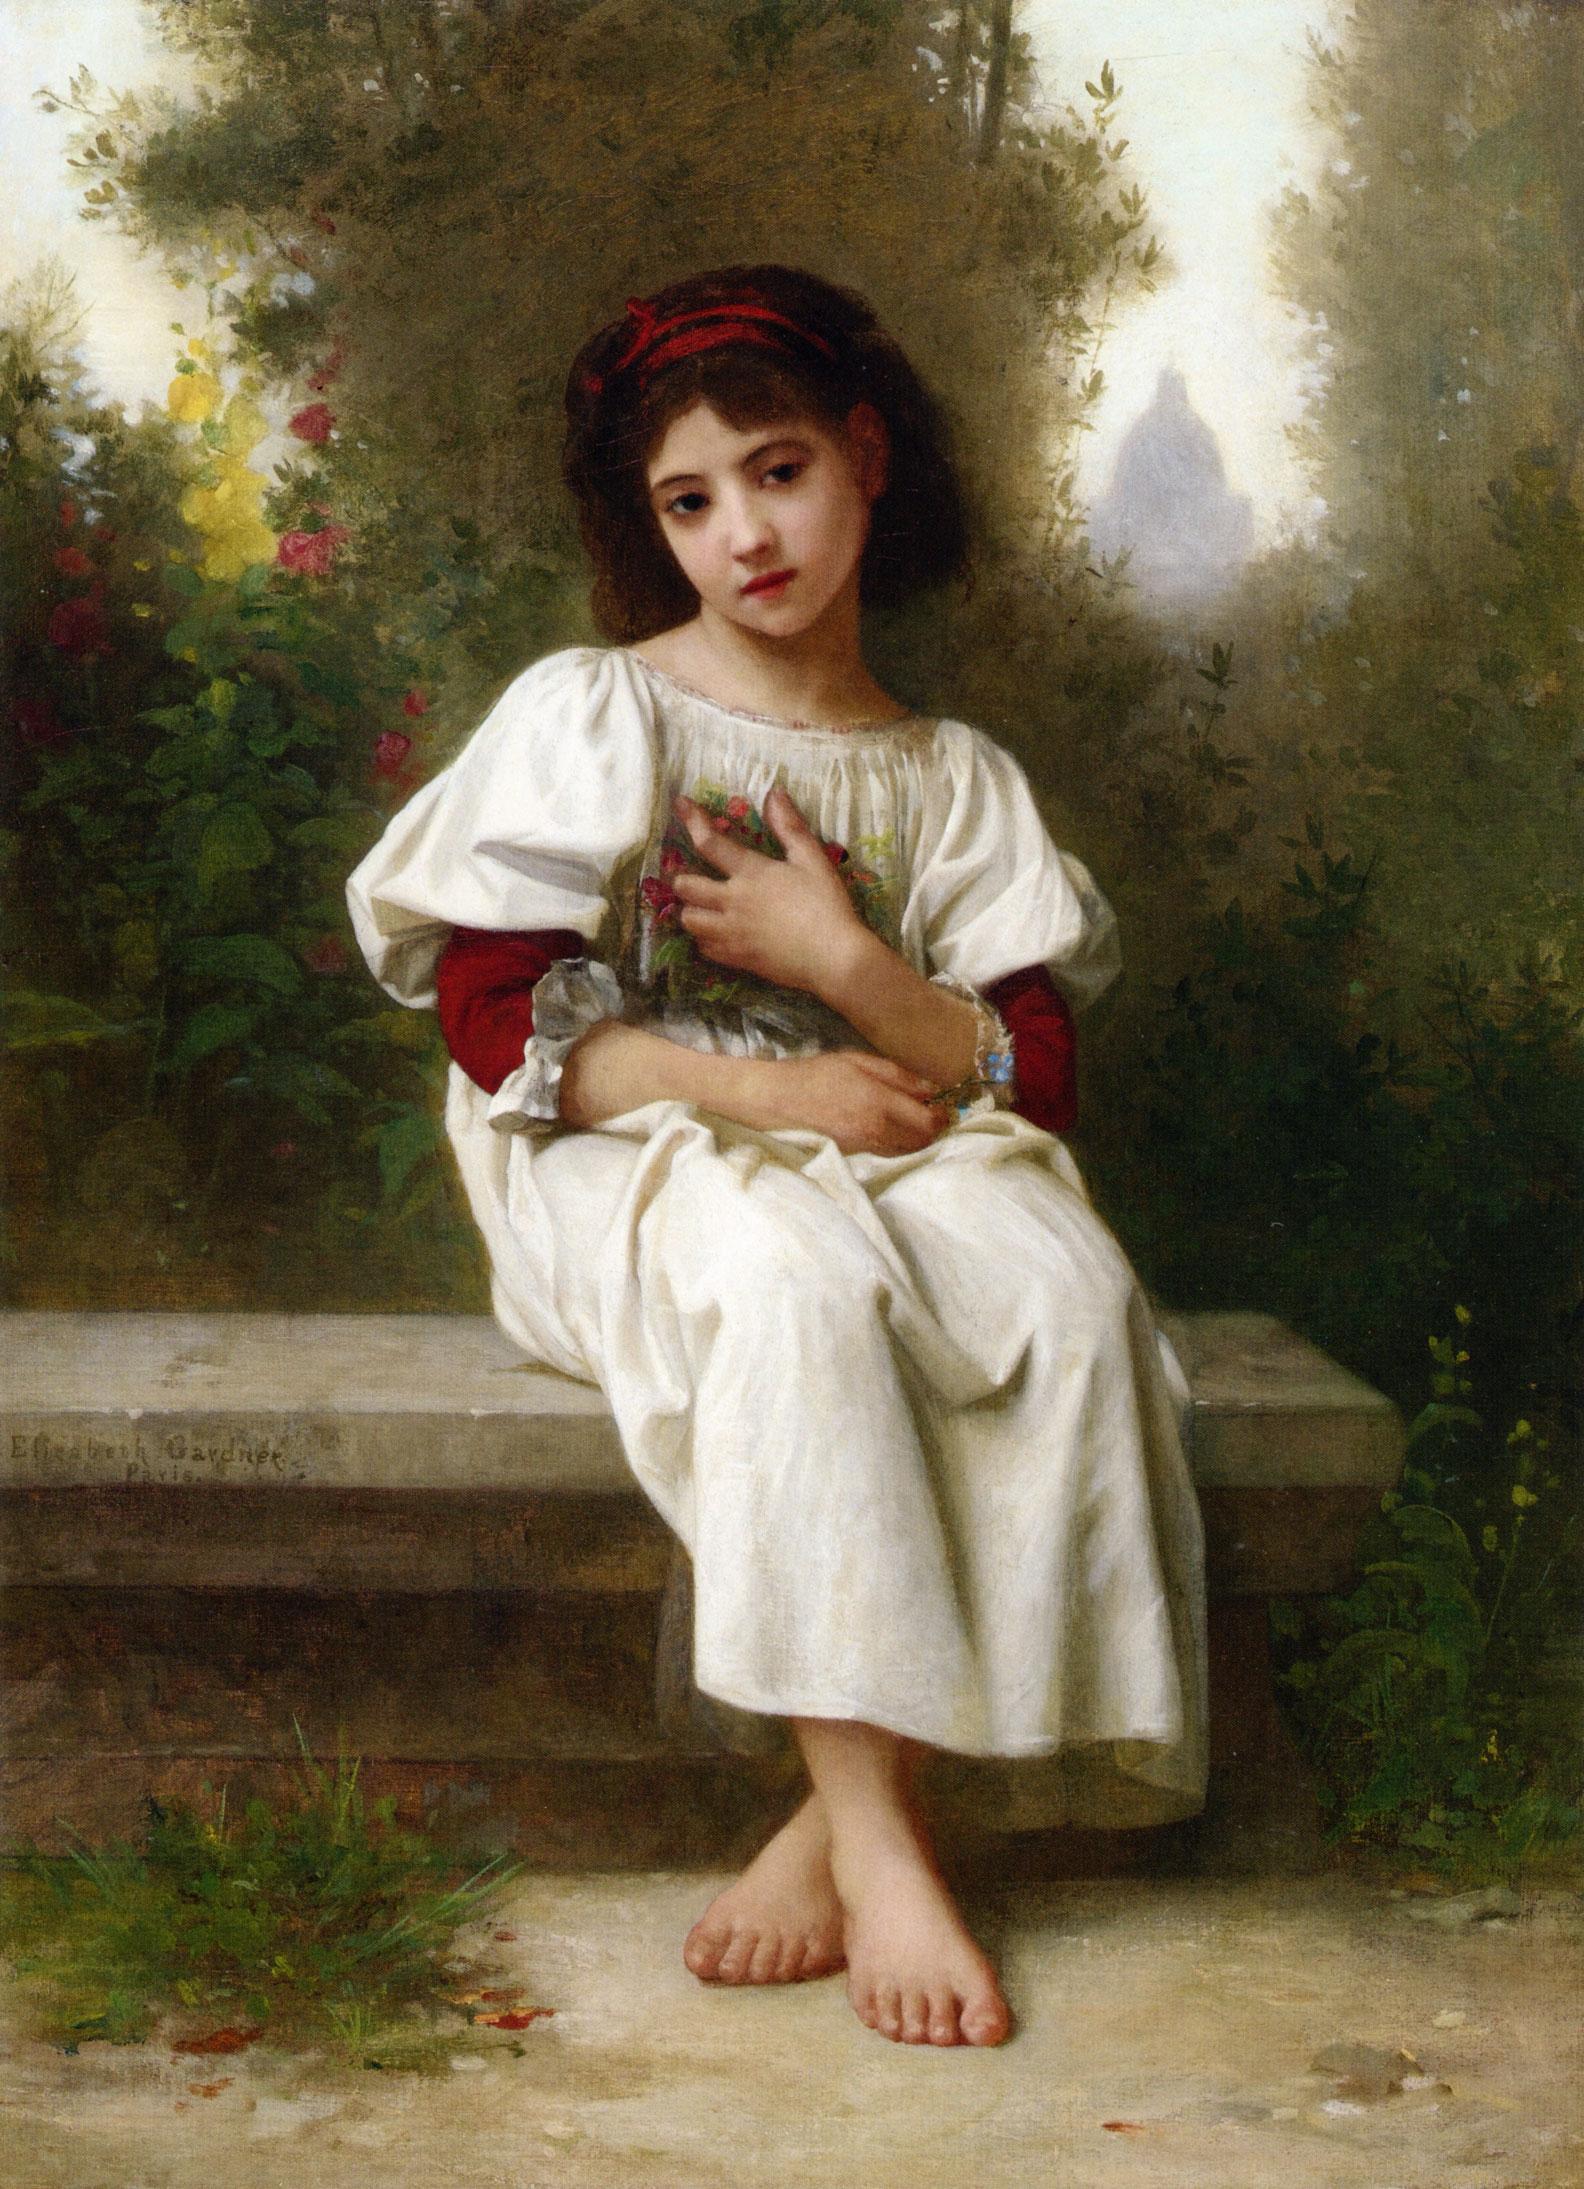 In the Garden :: Elizabeth Jane Gardner Bouguereau - Portraits of young girls in art and painting ôîòî